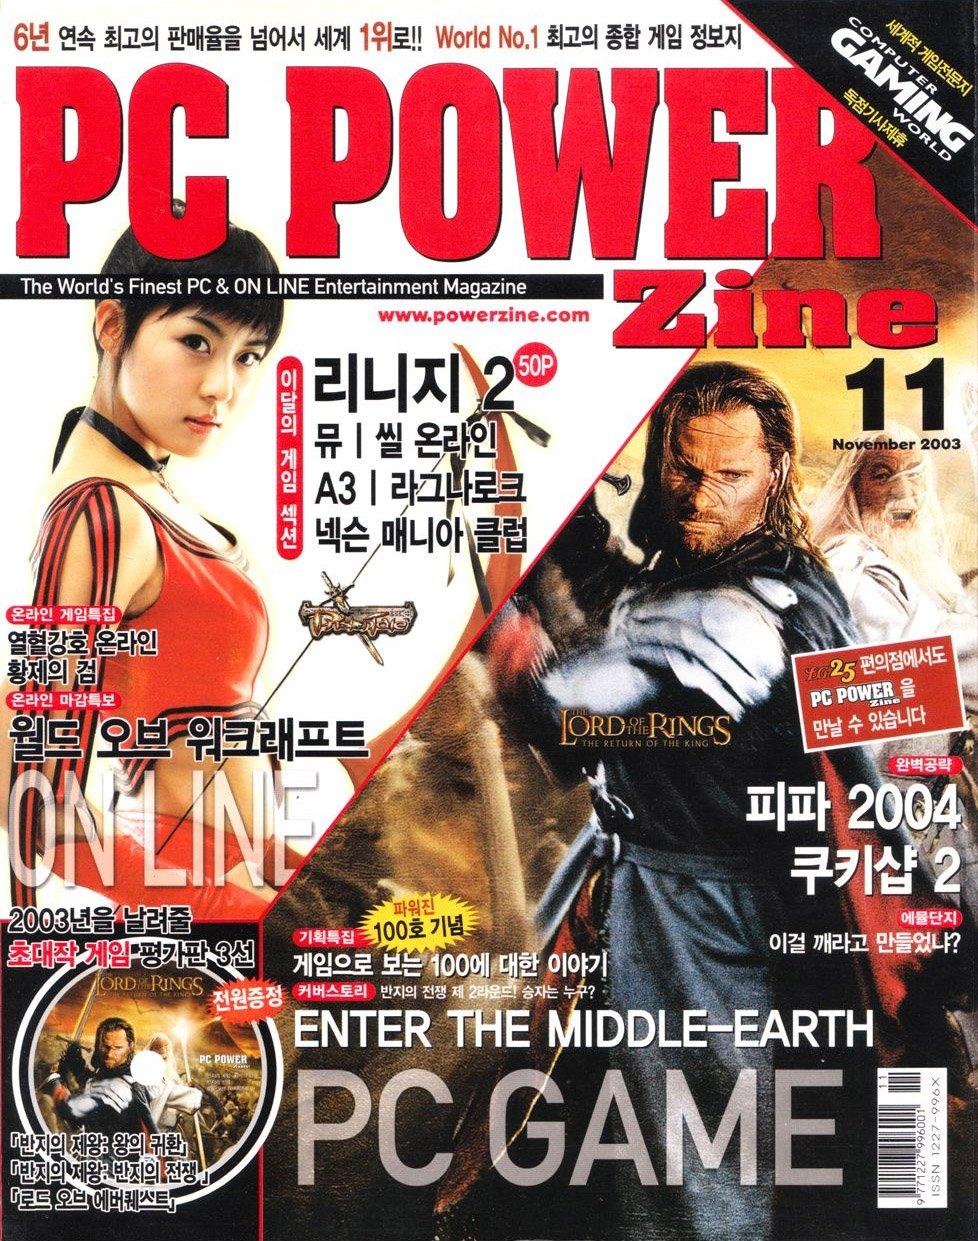 PC Power Zine Issue 100 (November 2003)